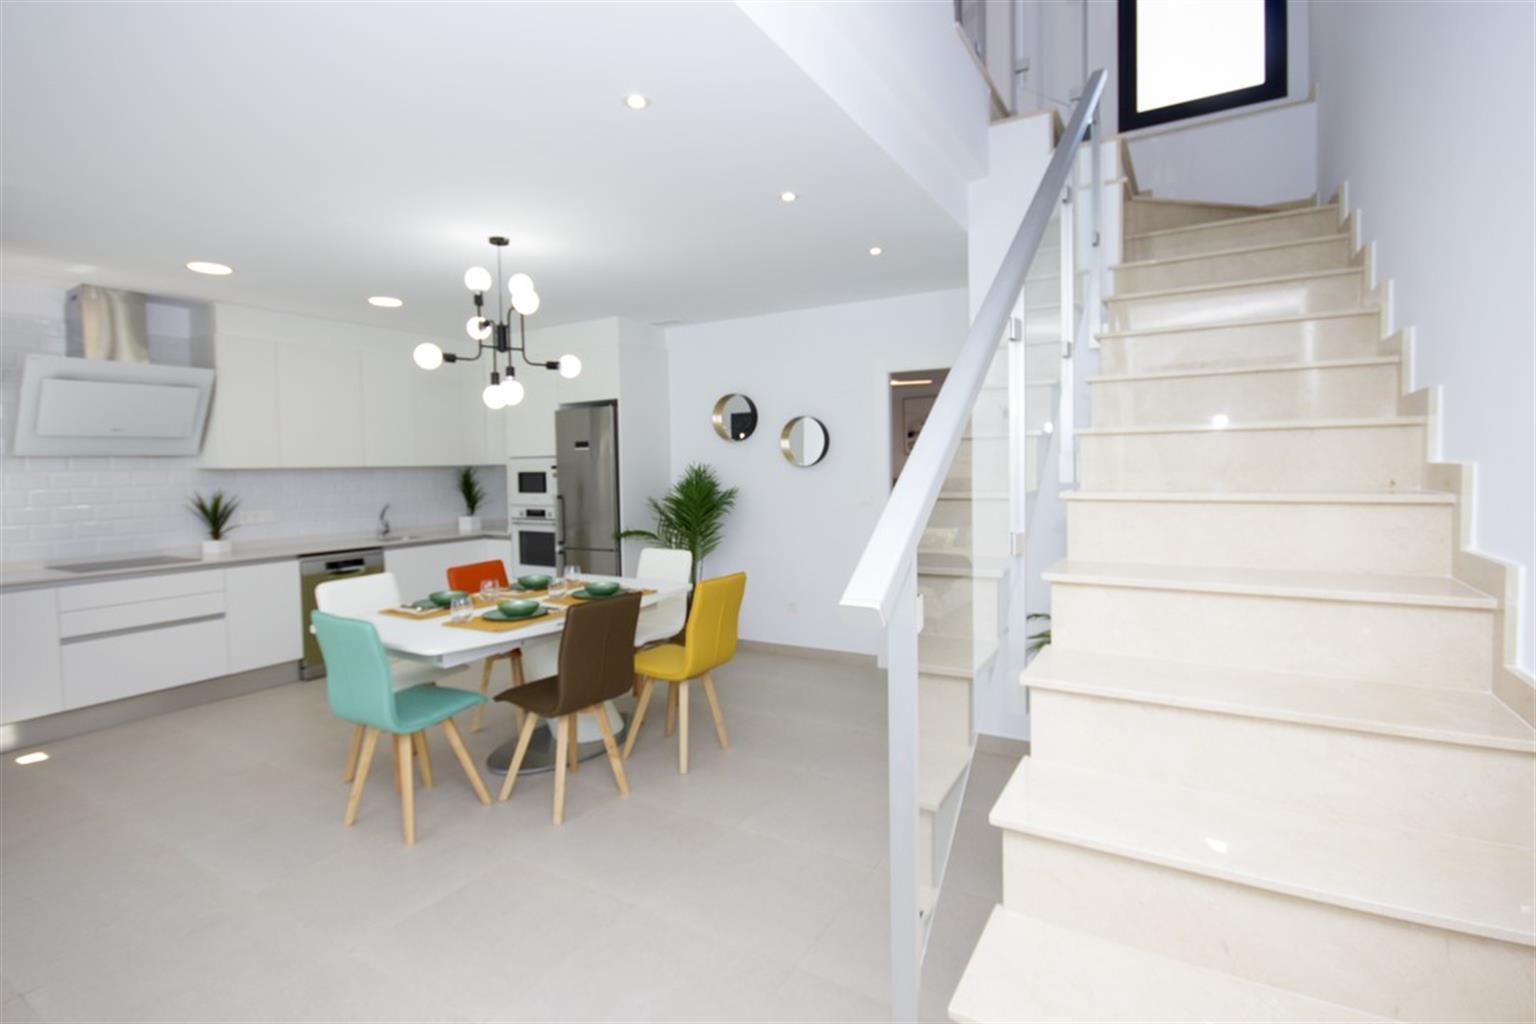 Maison - Almoradi  - #4231529-36